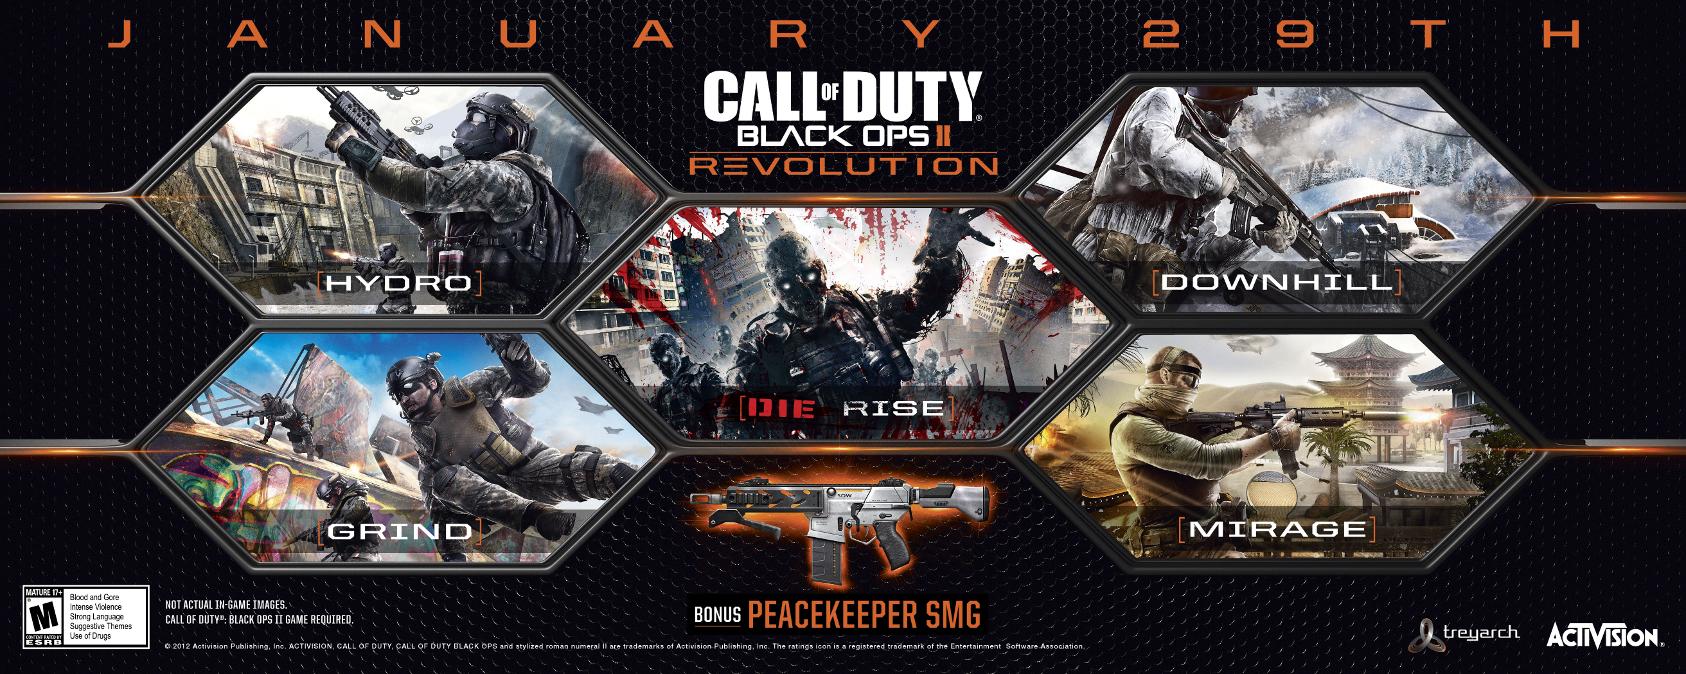 Call of Duty: Black Ops 2: DLC Revolution